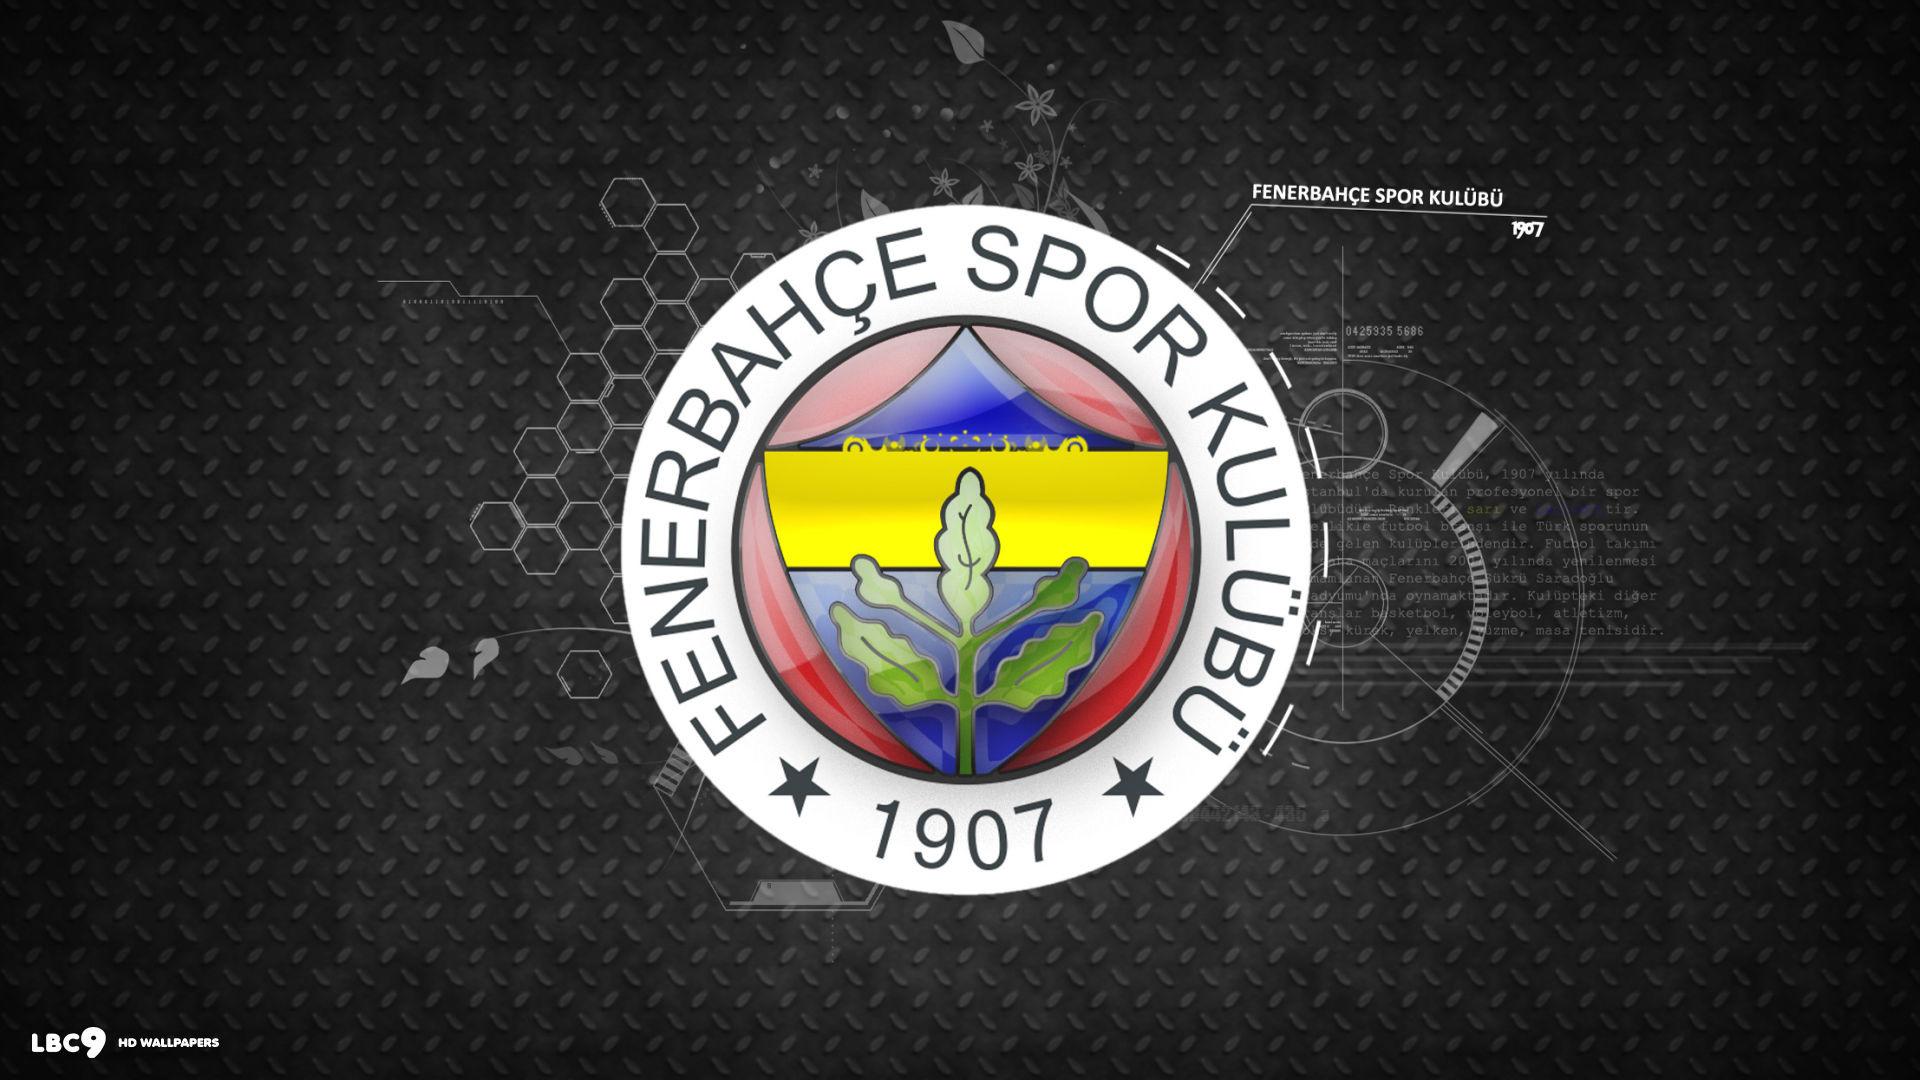 Free Ncaa Football Wallpaper Dotty Oda Fenerbahçe